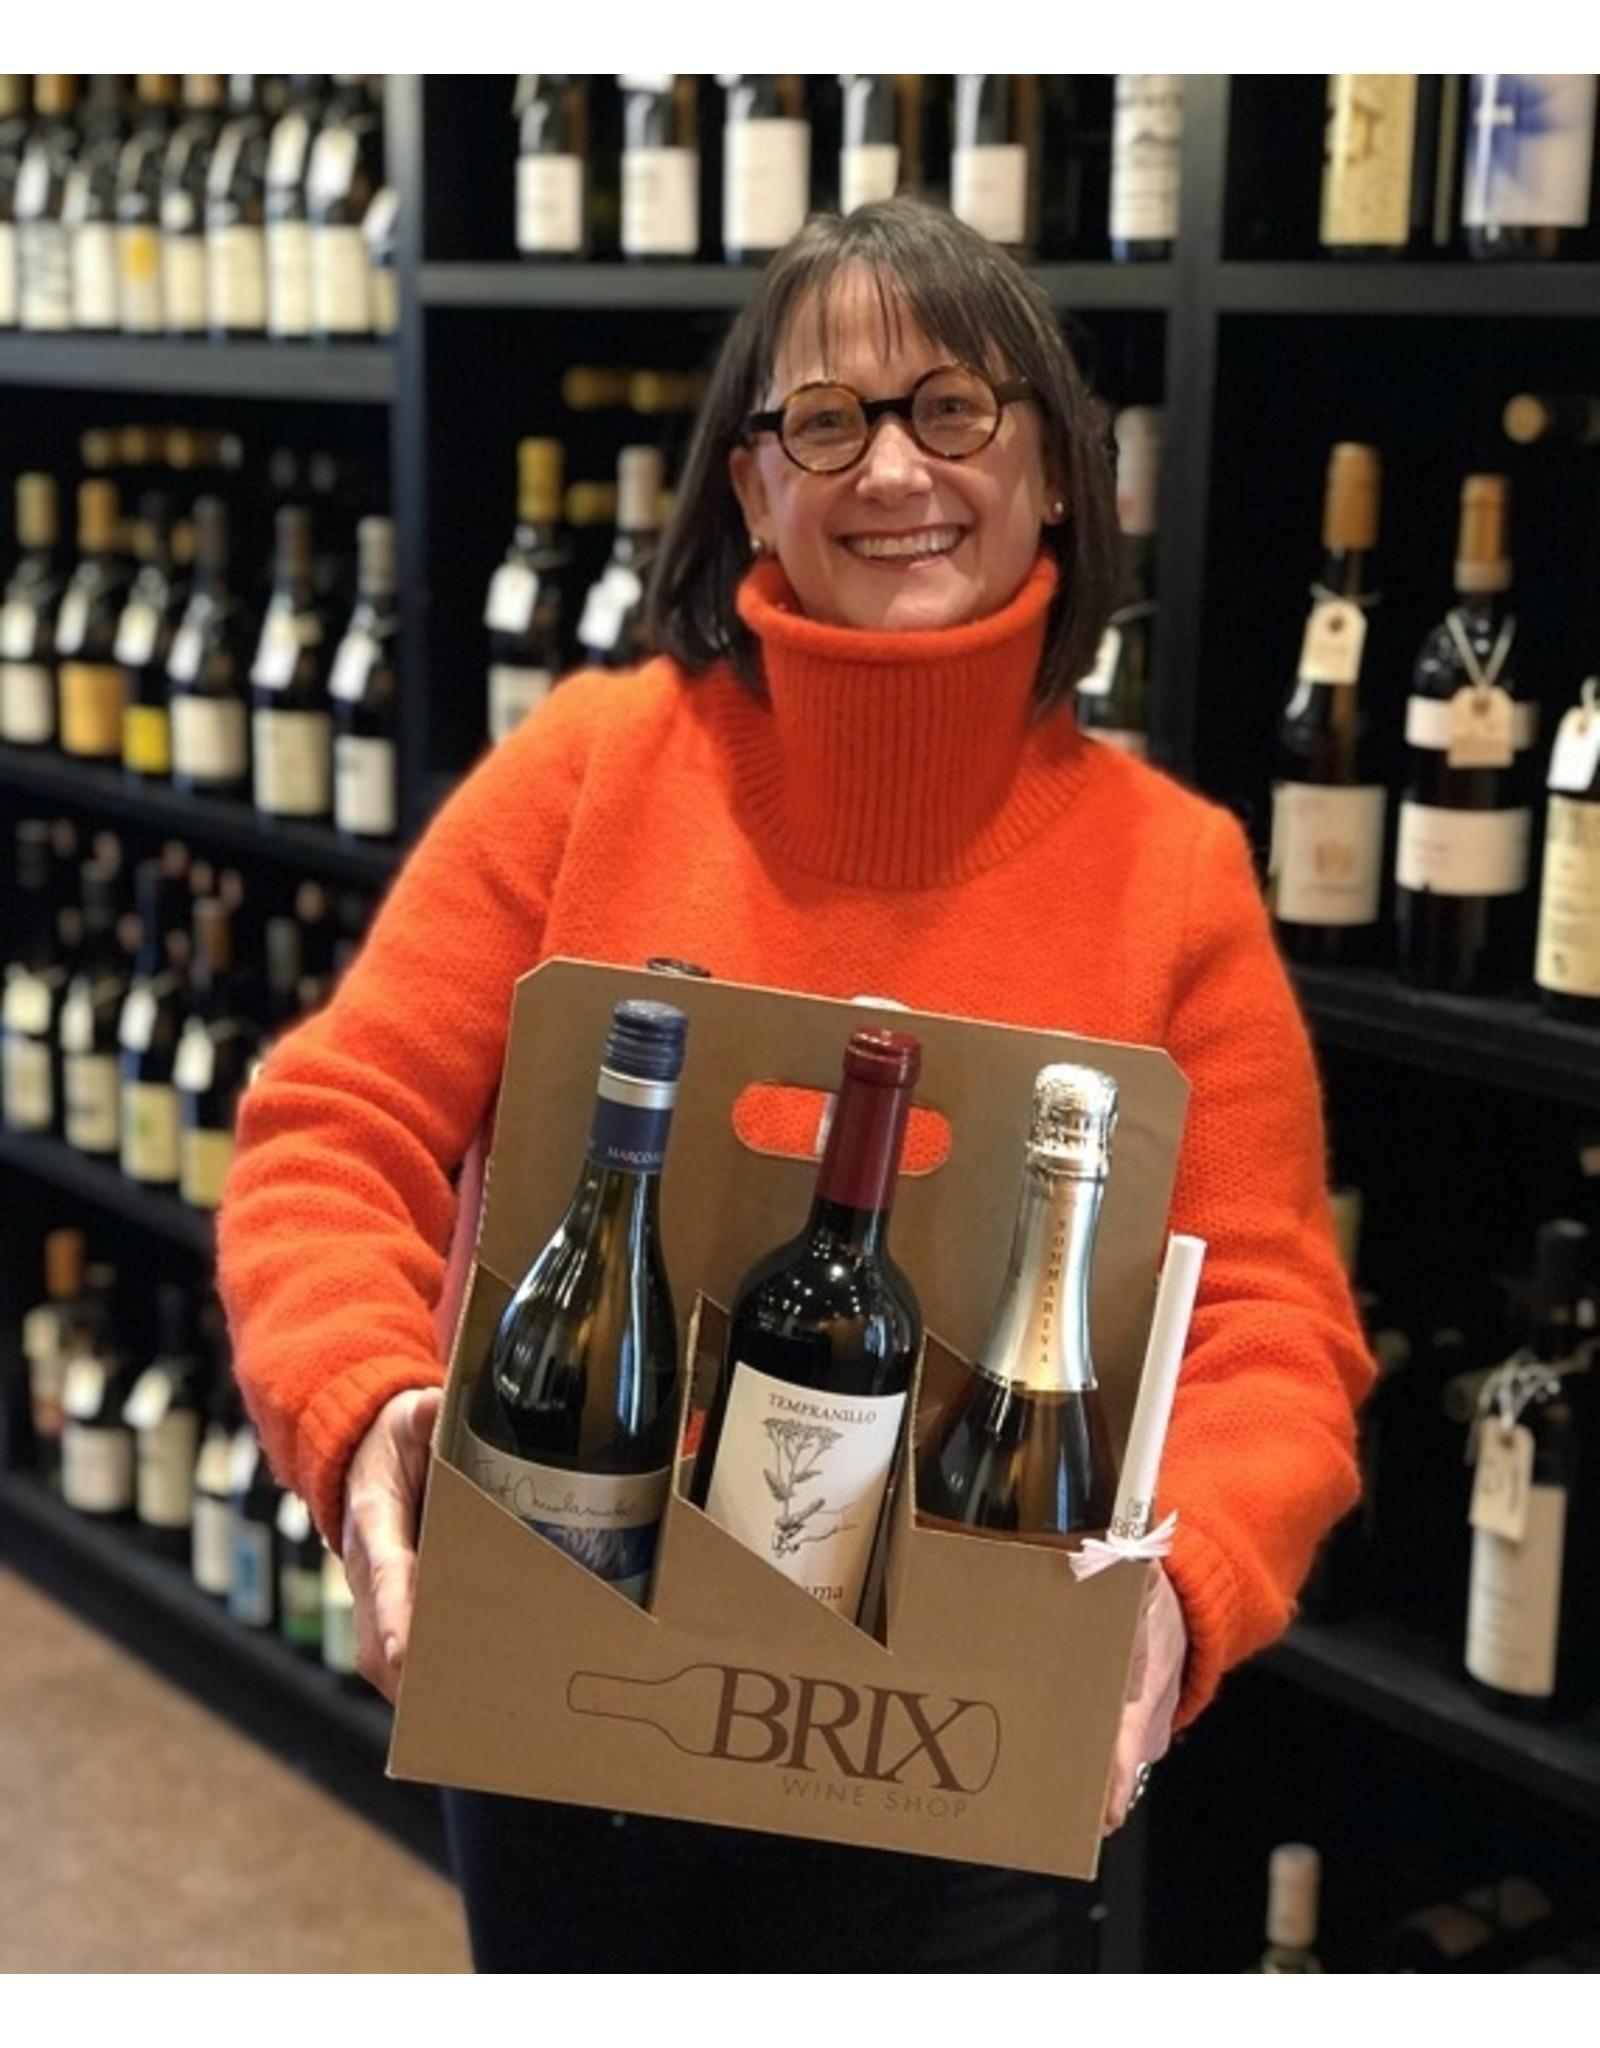 The March BRIX Six—Celebrating Women in Wine